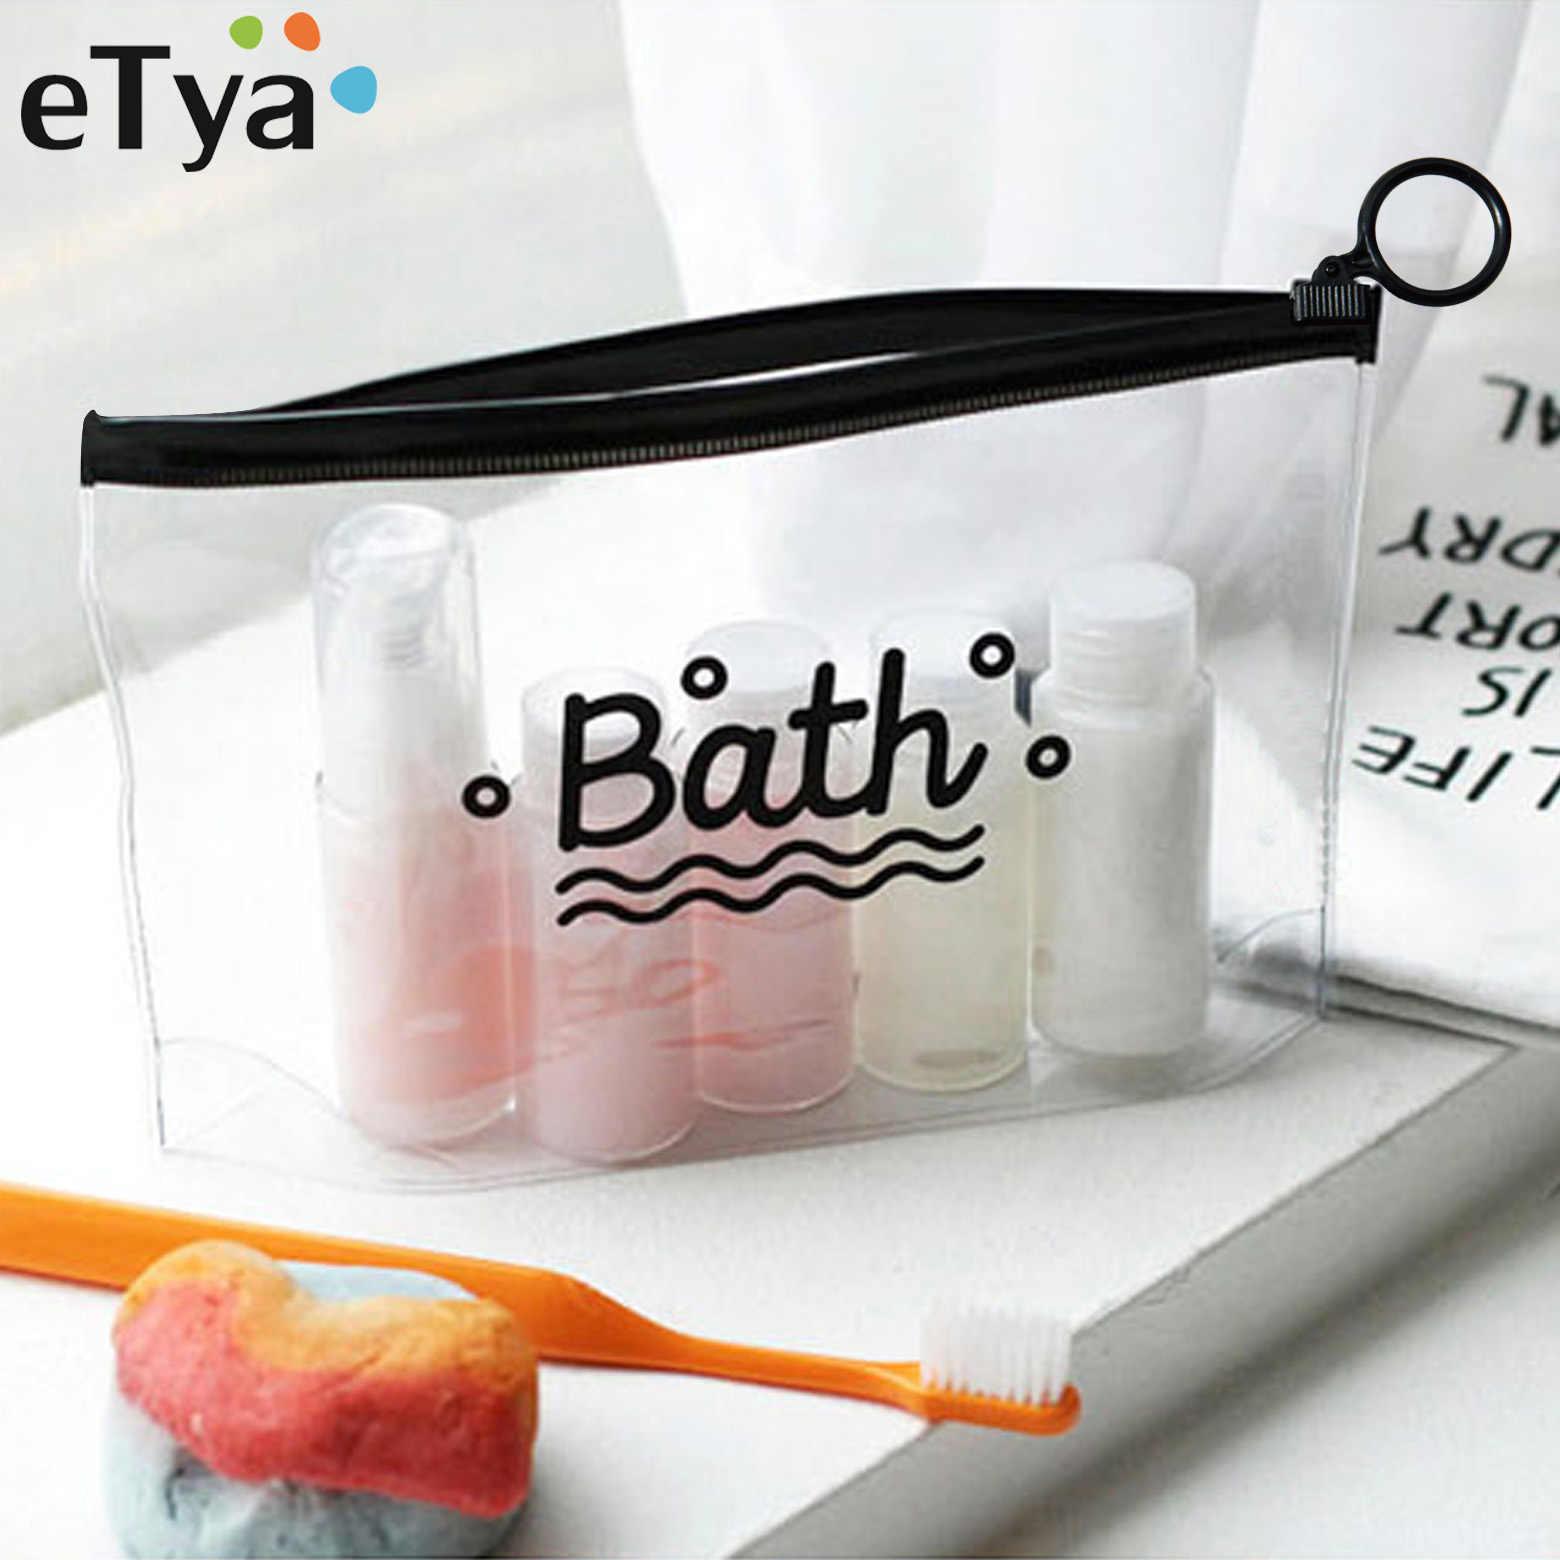 ETya de bolsos para cosméticos PVC impermeable transparente mujeres Portátil Bolsa neceser organizador de almacenamiento de bolsa de maquillaje bolsa